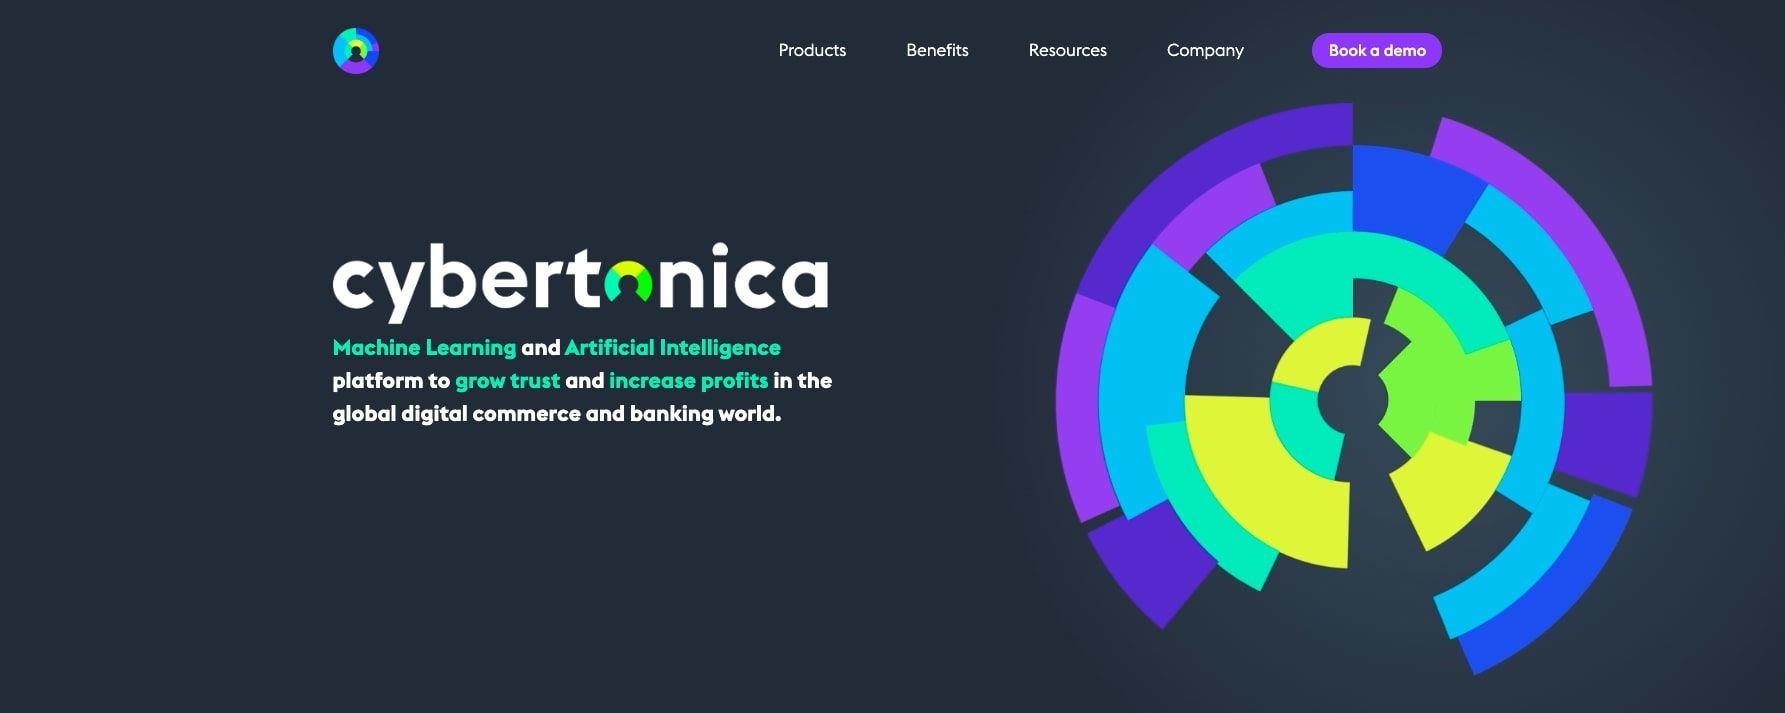 Cybertonica FinTech Website Homepage